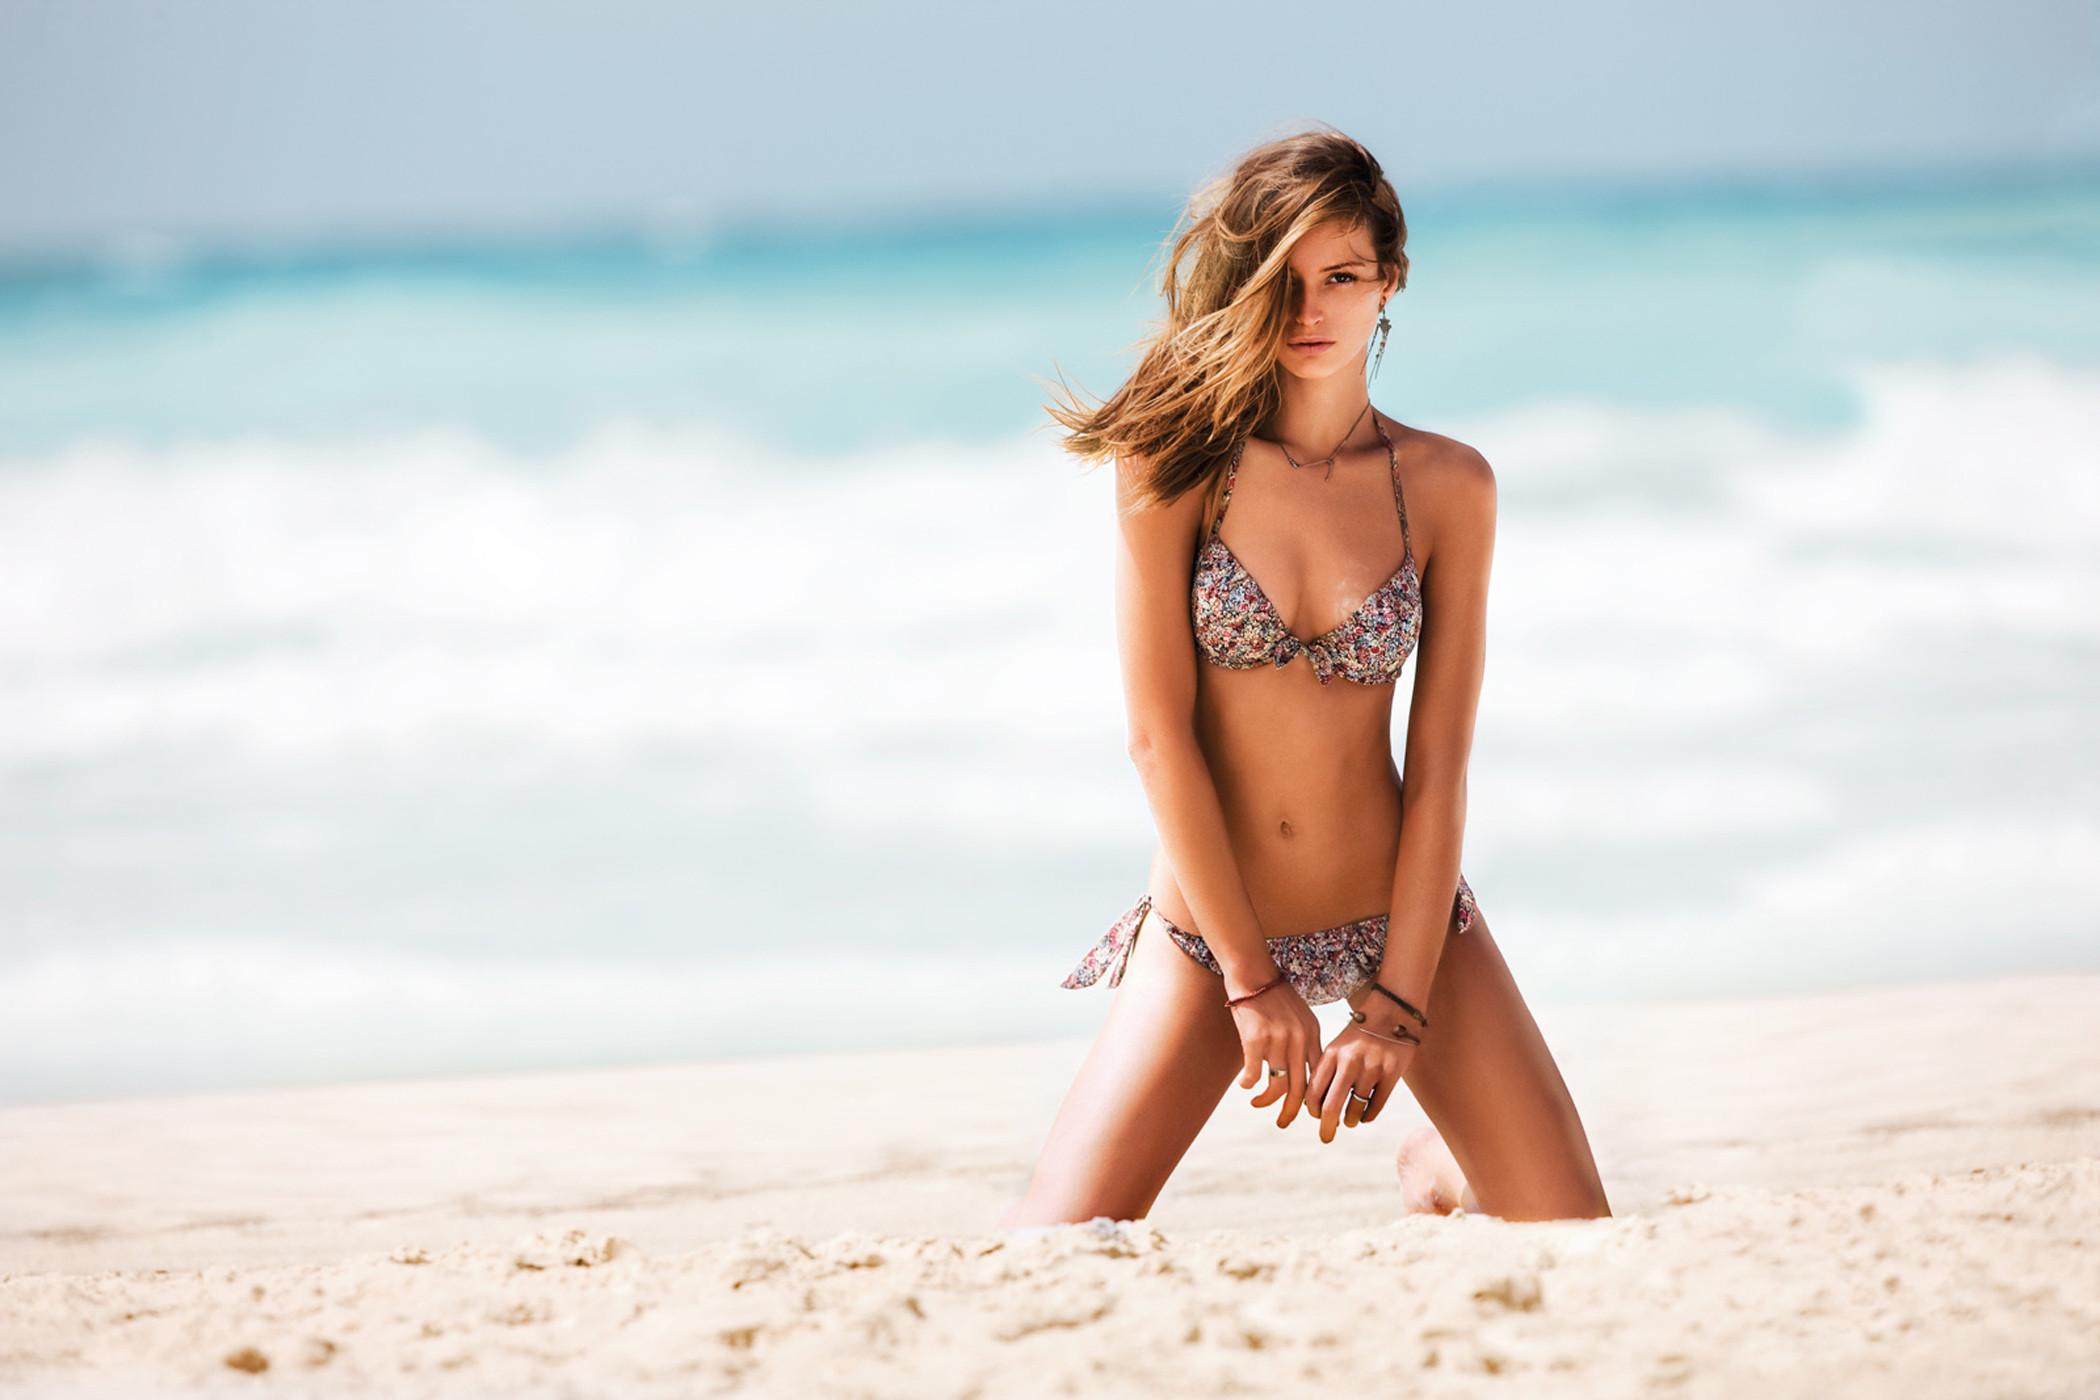 Girls-on-Beach-Wallpapers-5.jpg (2100×1400)